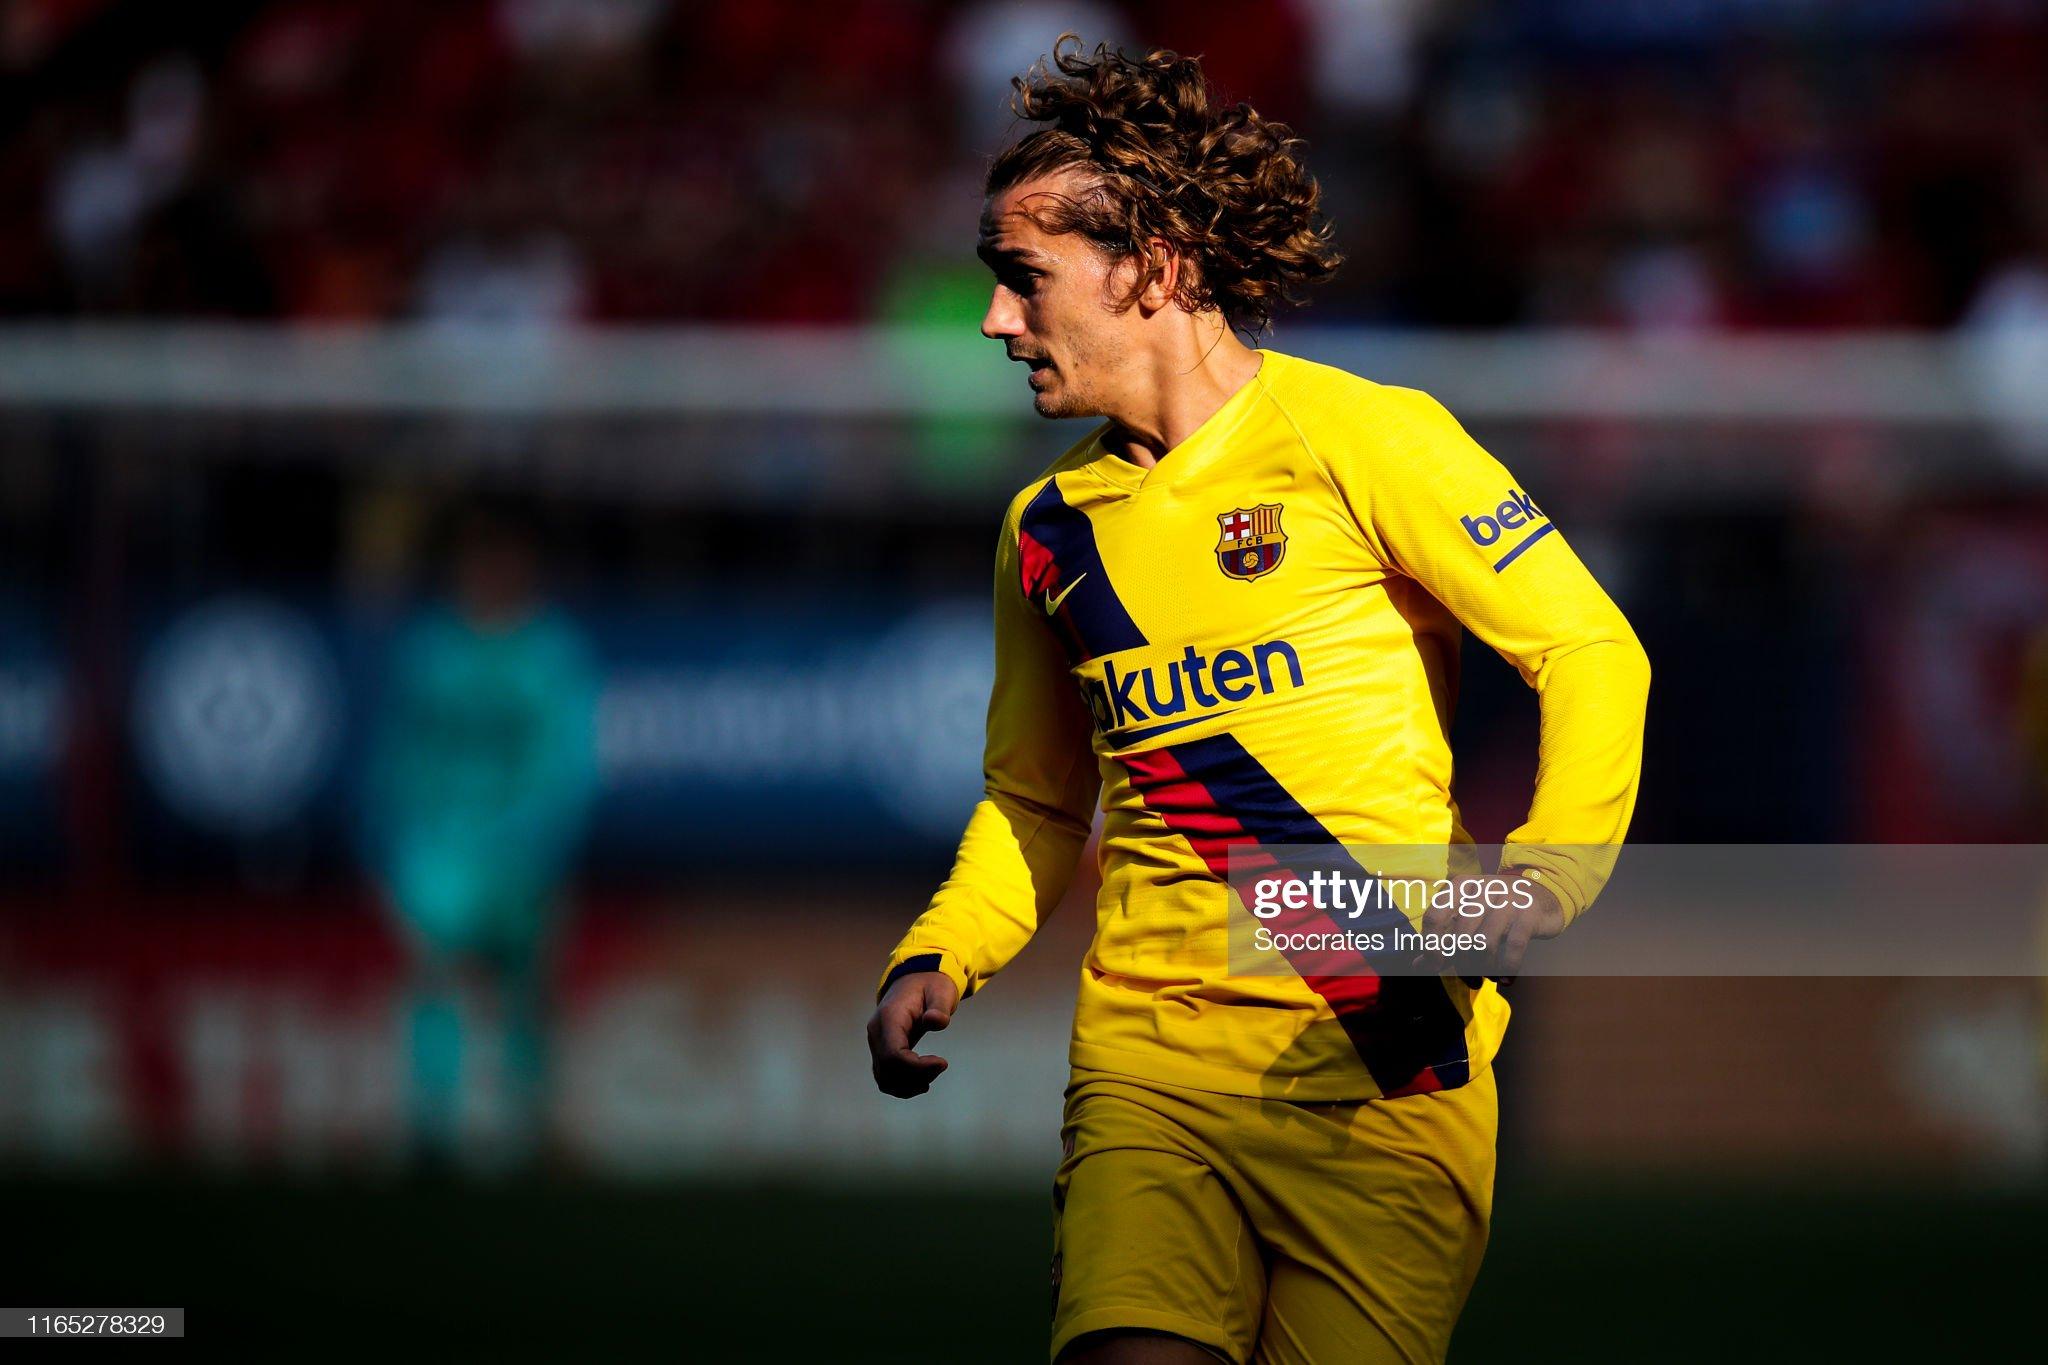 صور مباراة : أوساسونا - برشلونة 2-2 ( 31-08-2019 )  Antoine-griezmann-of-fc-barcelona-during-the-la-liga-santander-match-picture-id1165278329?s=2048x2048